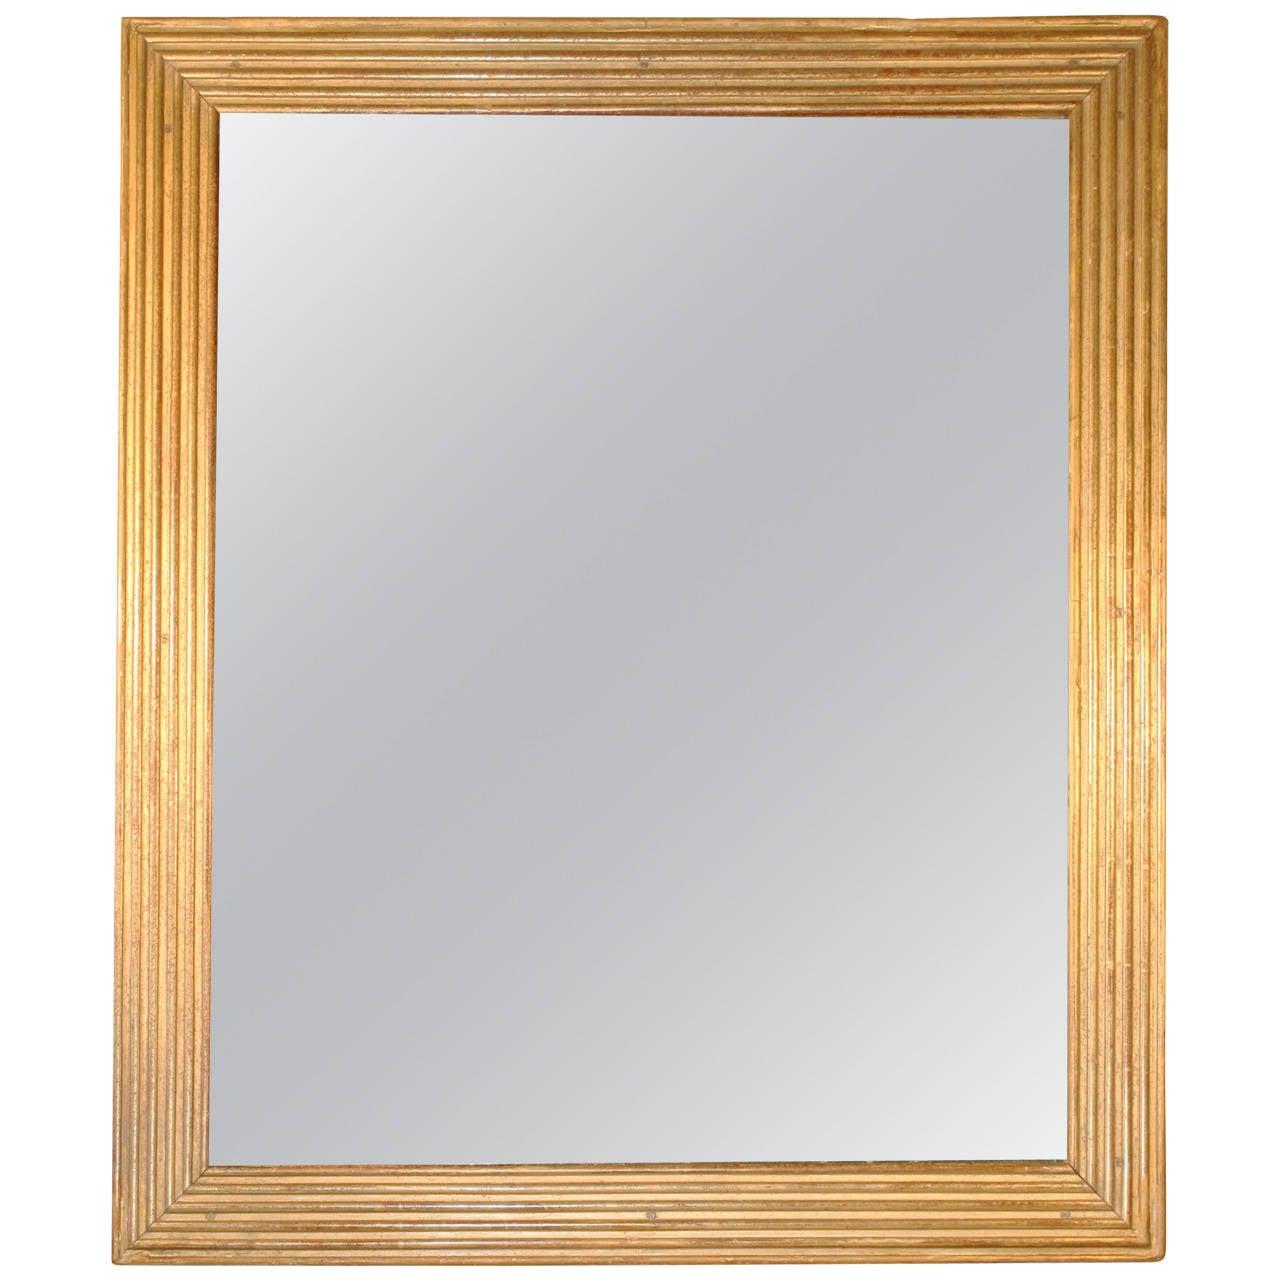 Arched gilt mirror at 1stdibs - 18th Century French Louis Xvi Gilt Frame Mirror 1